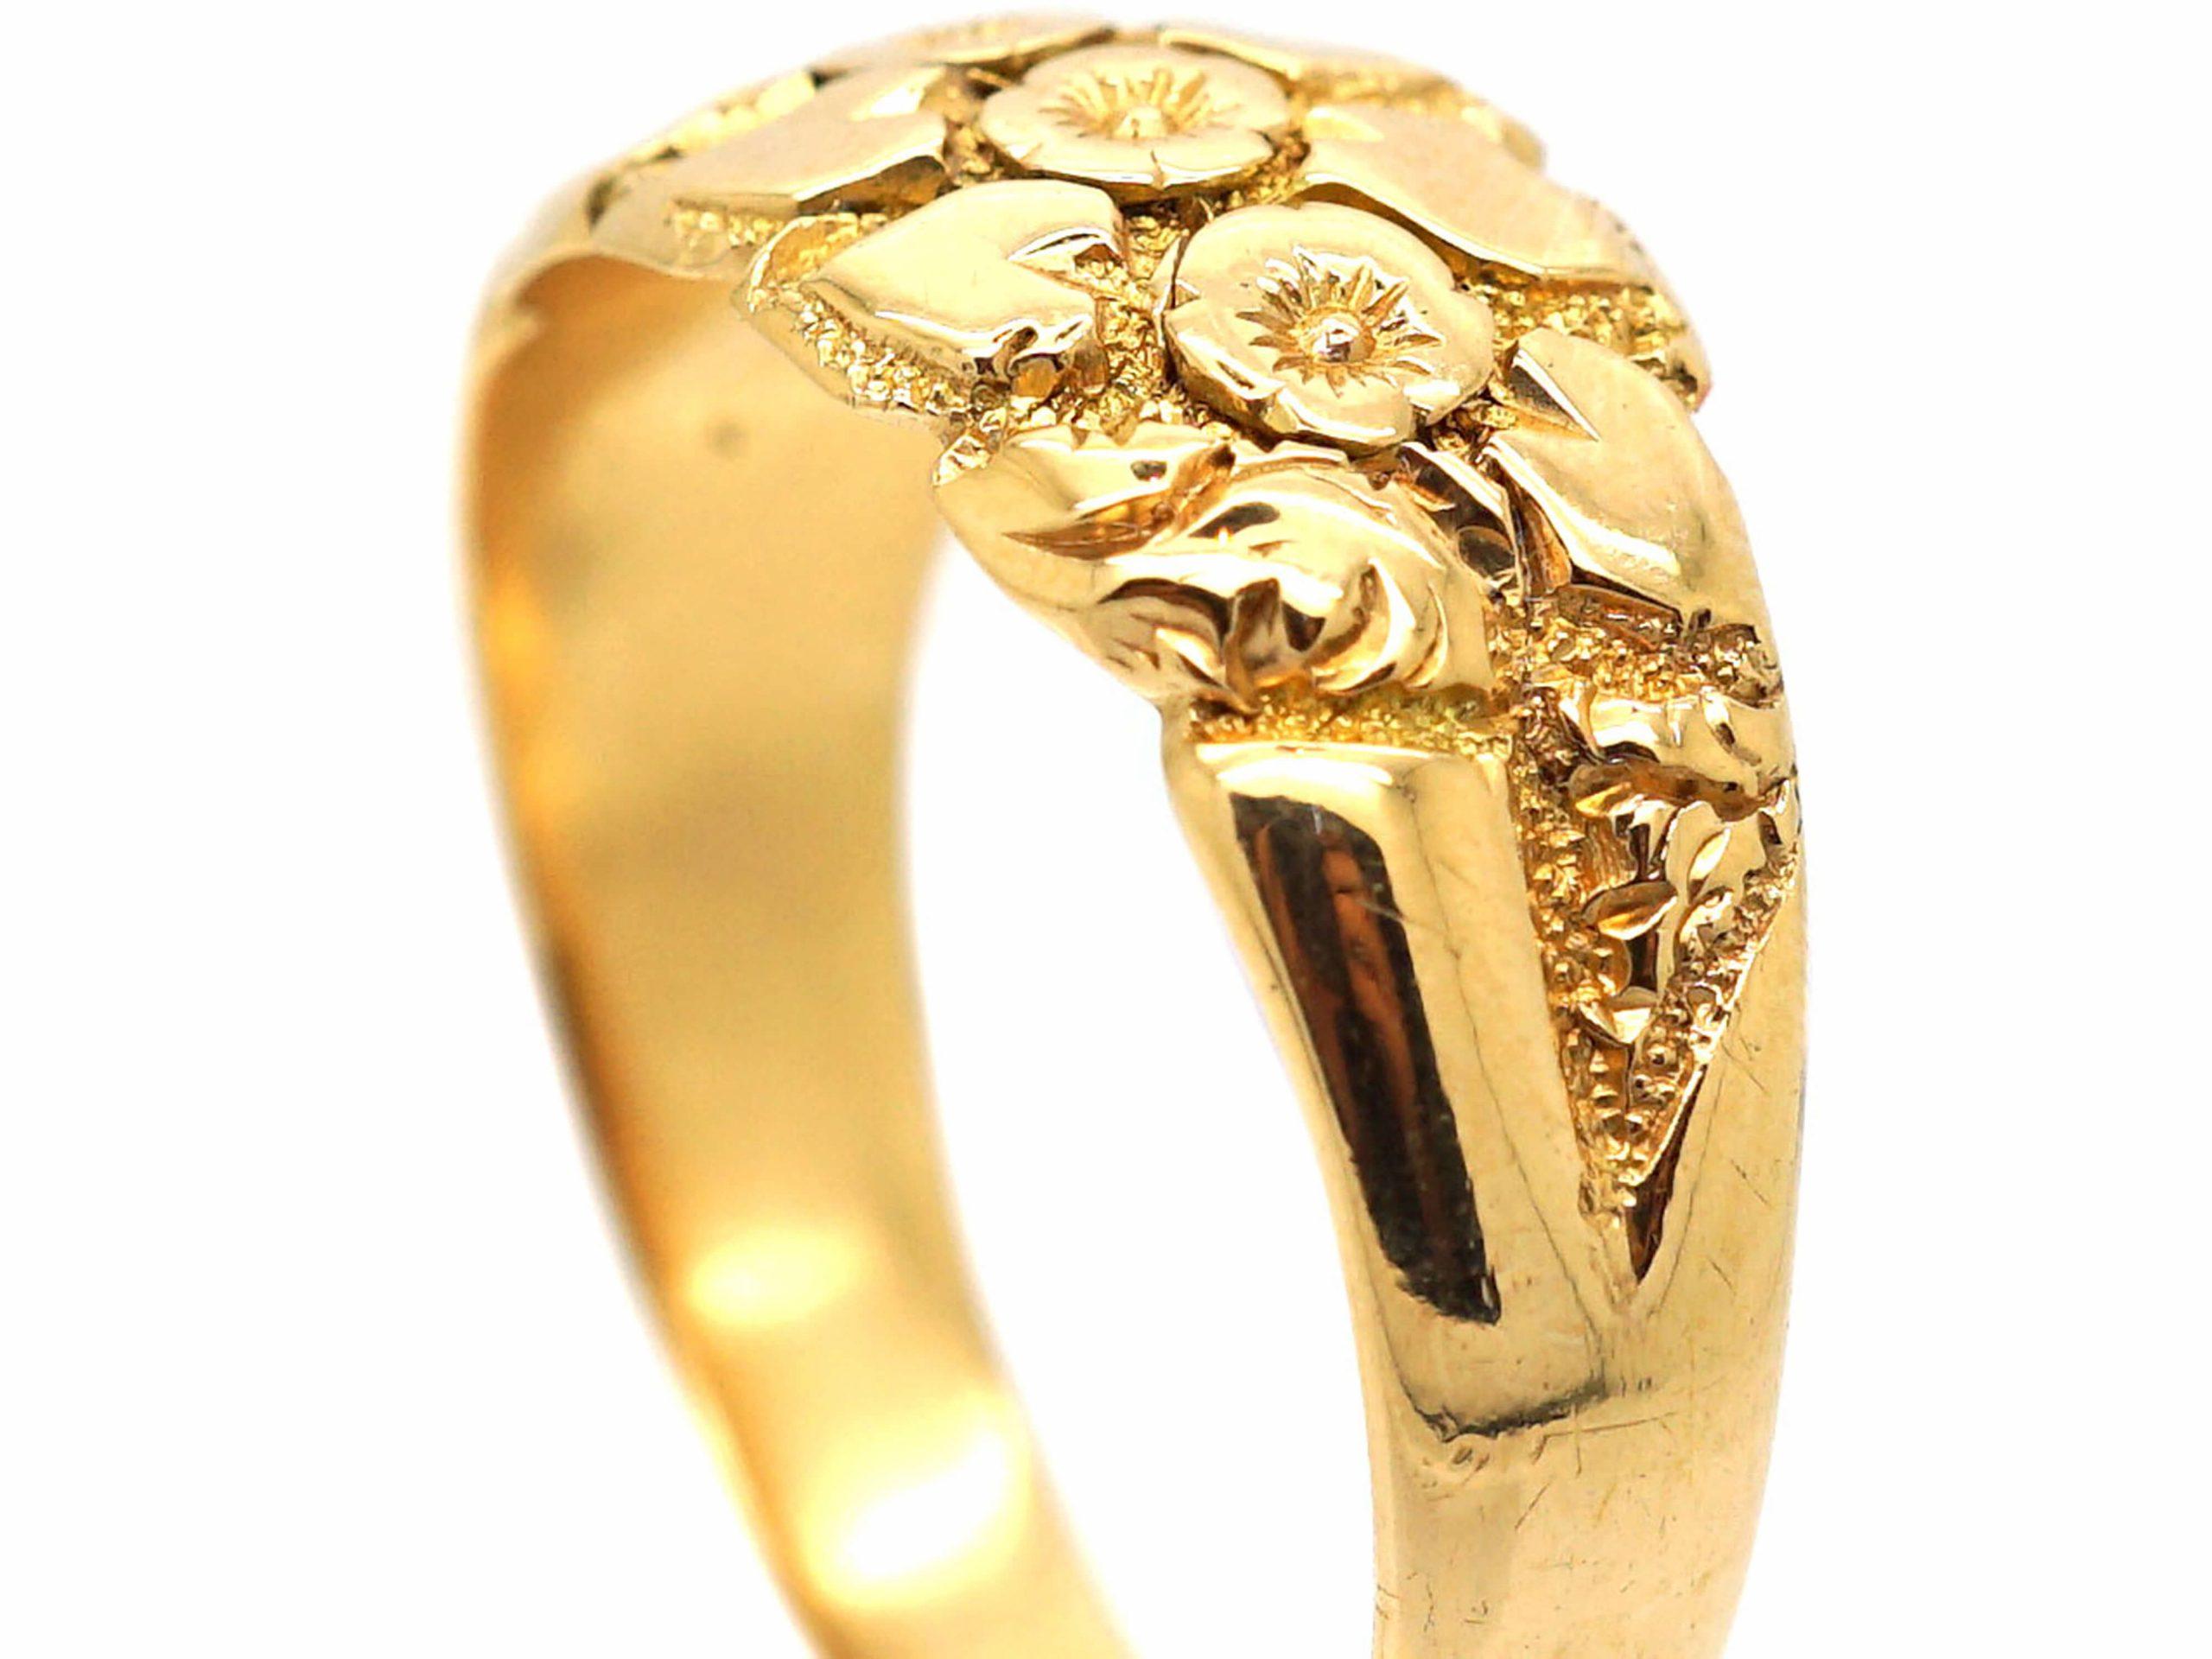 Edwardian 18ct Gold Keeper Ring